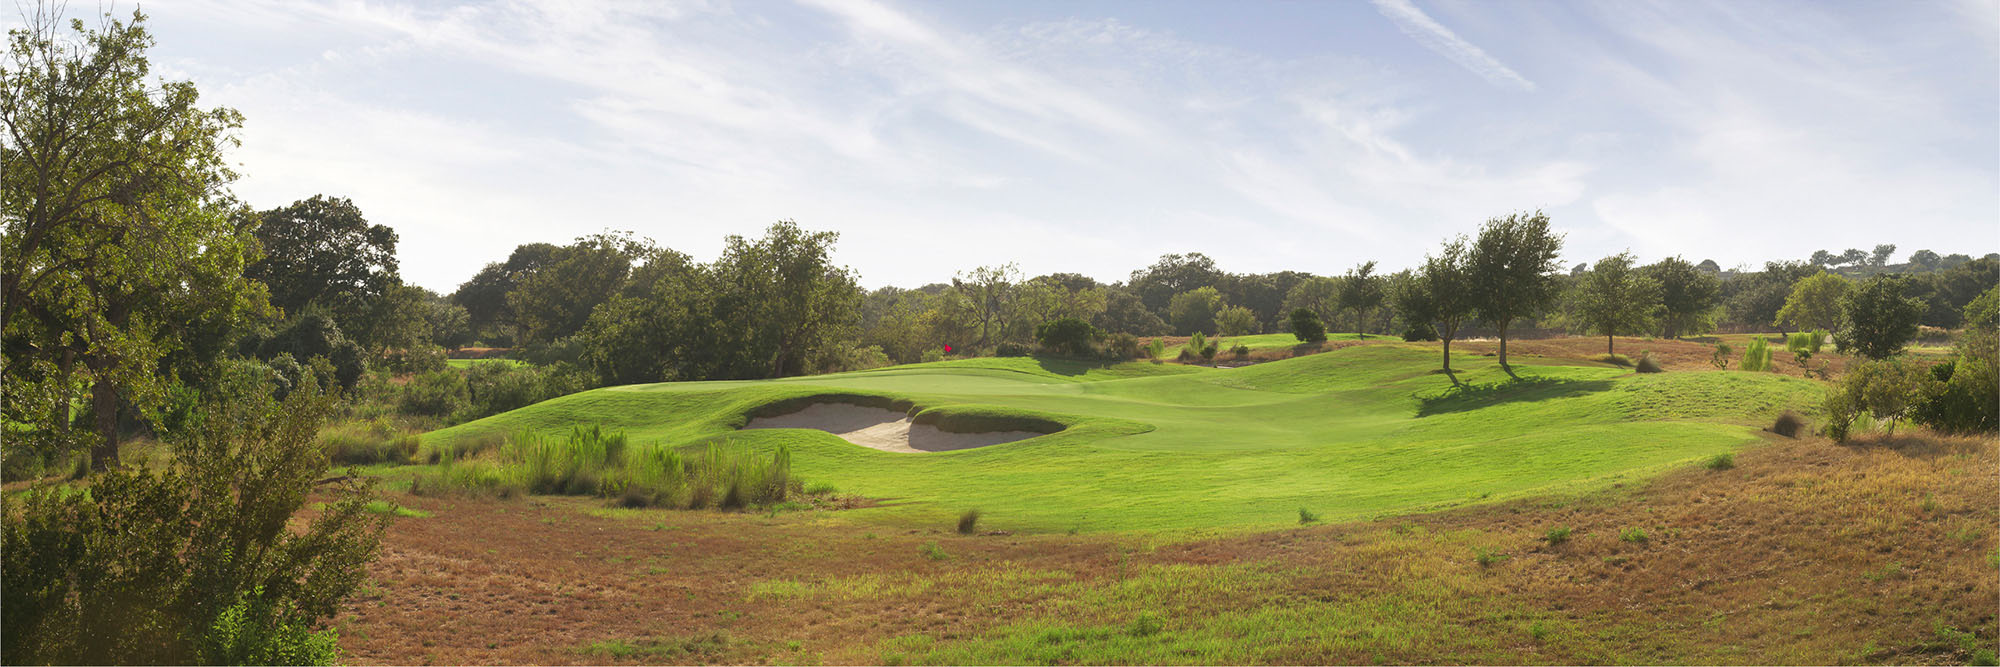 Golf Course Image - Escondido No. 3